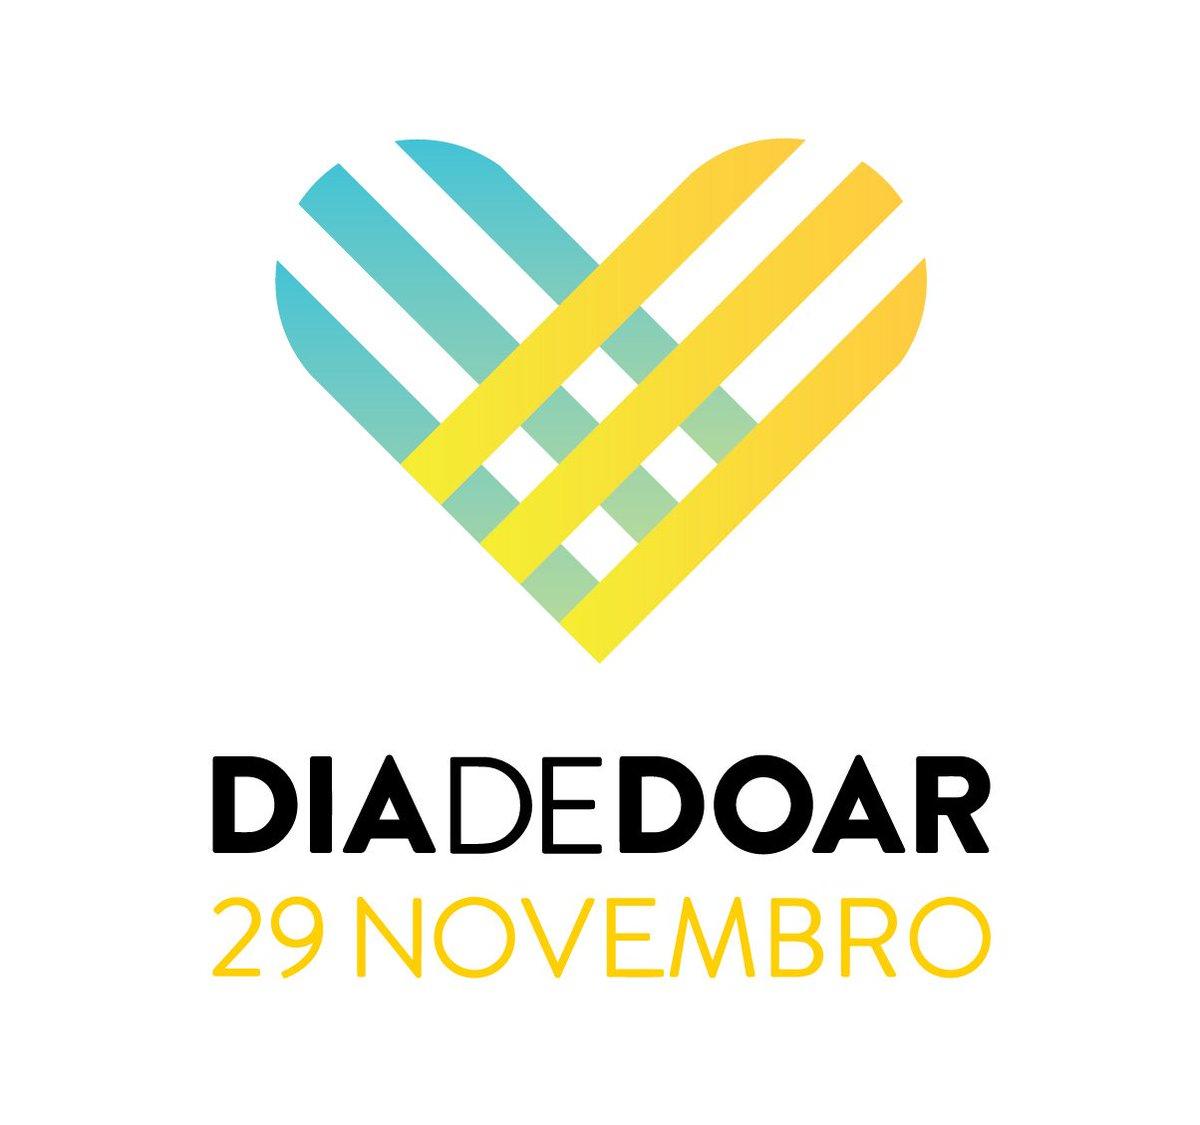 #diadedoar: #diadedoar